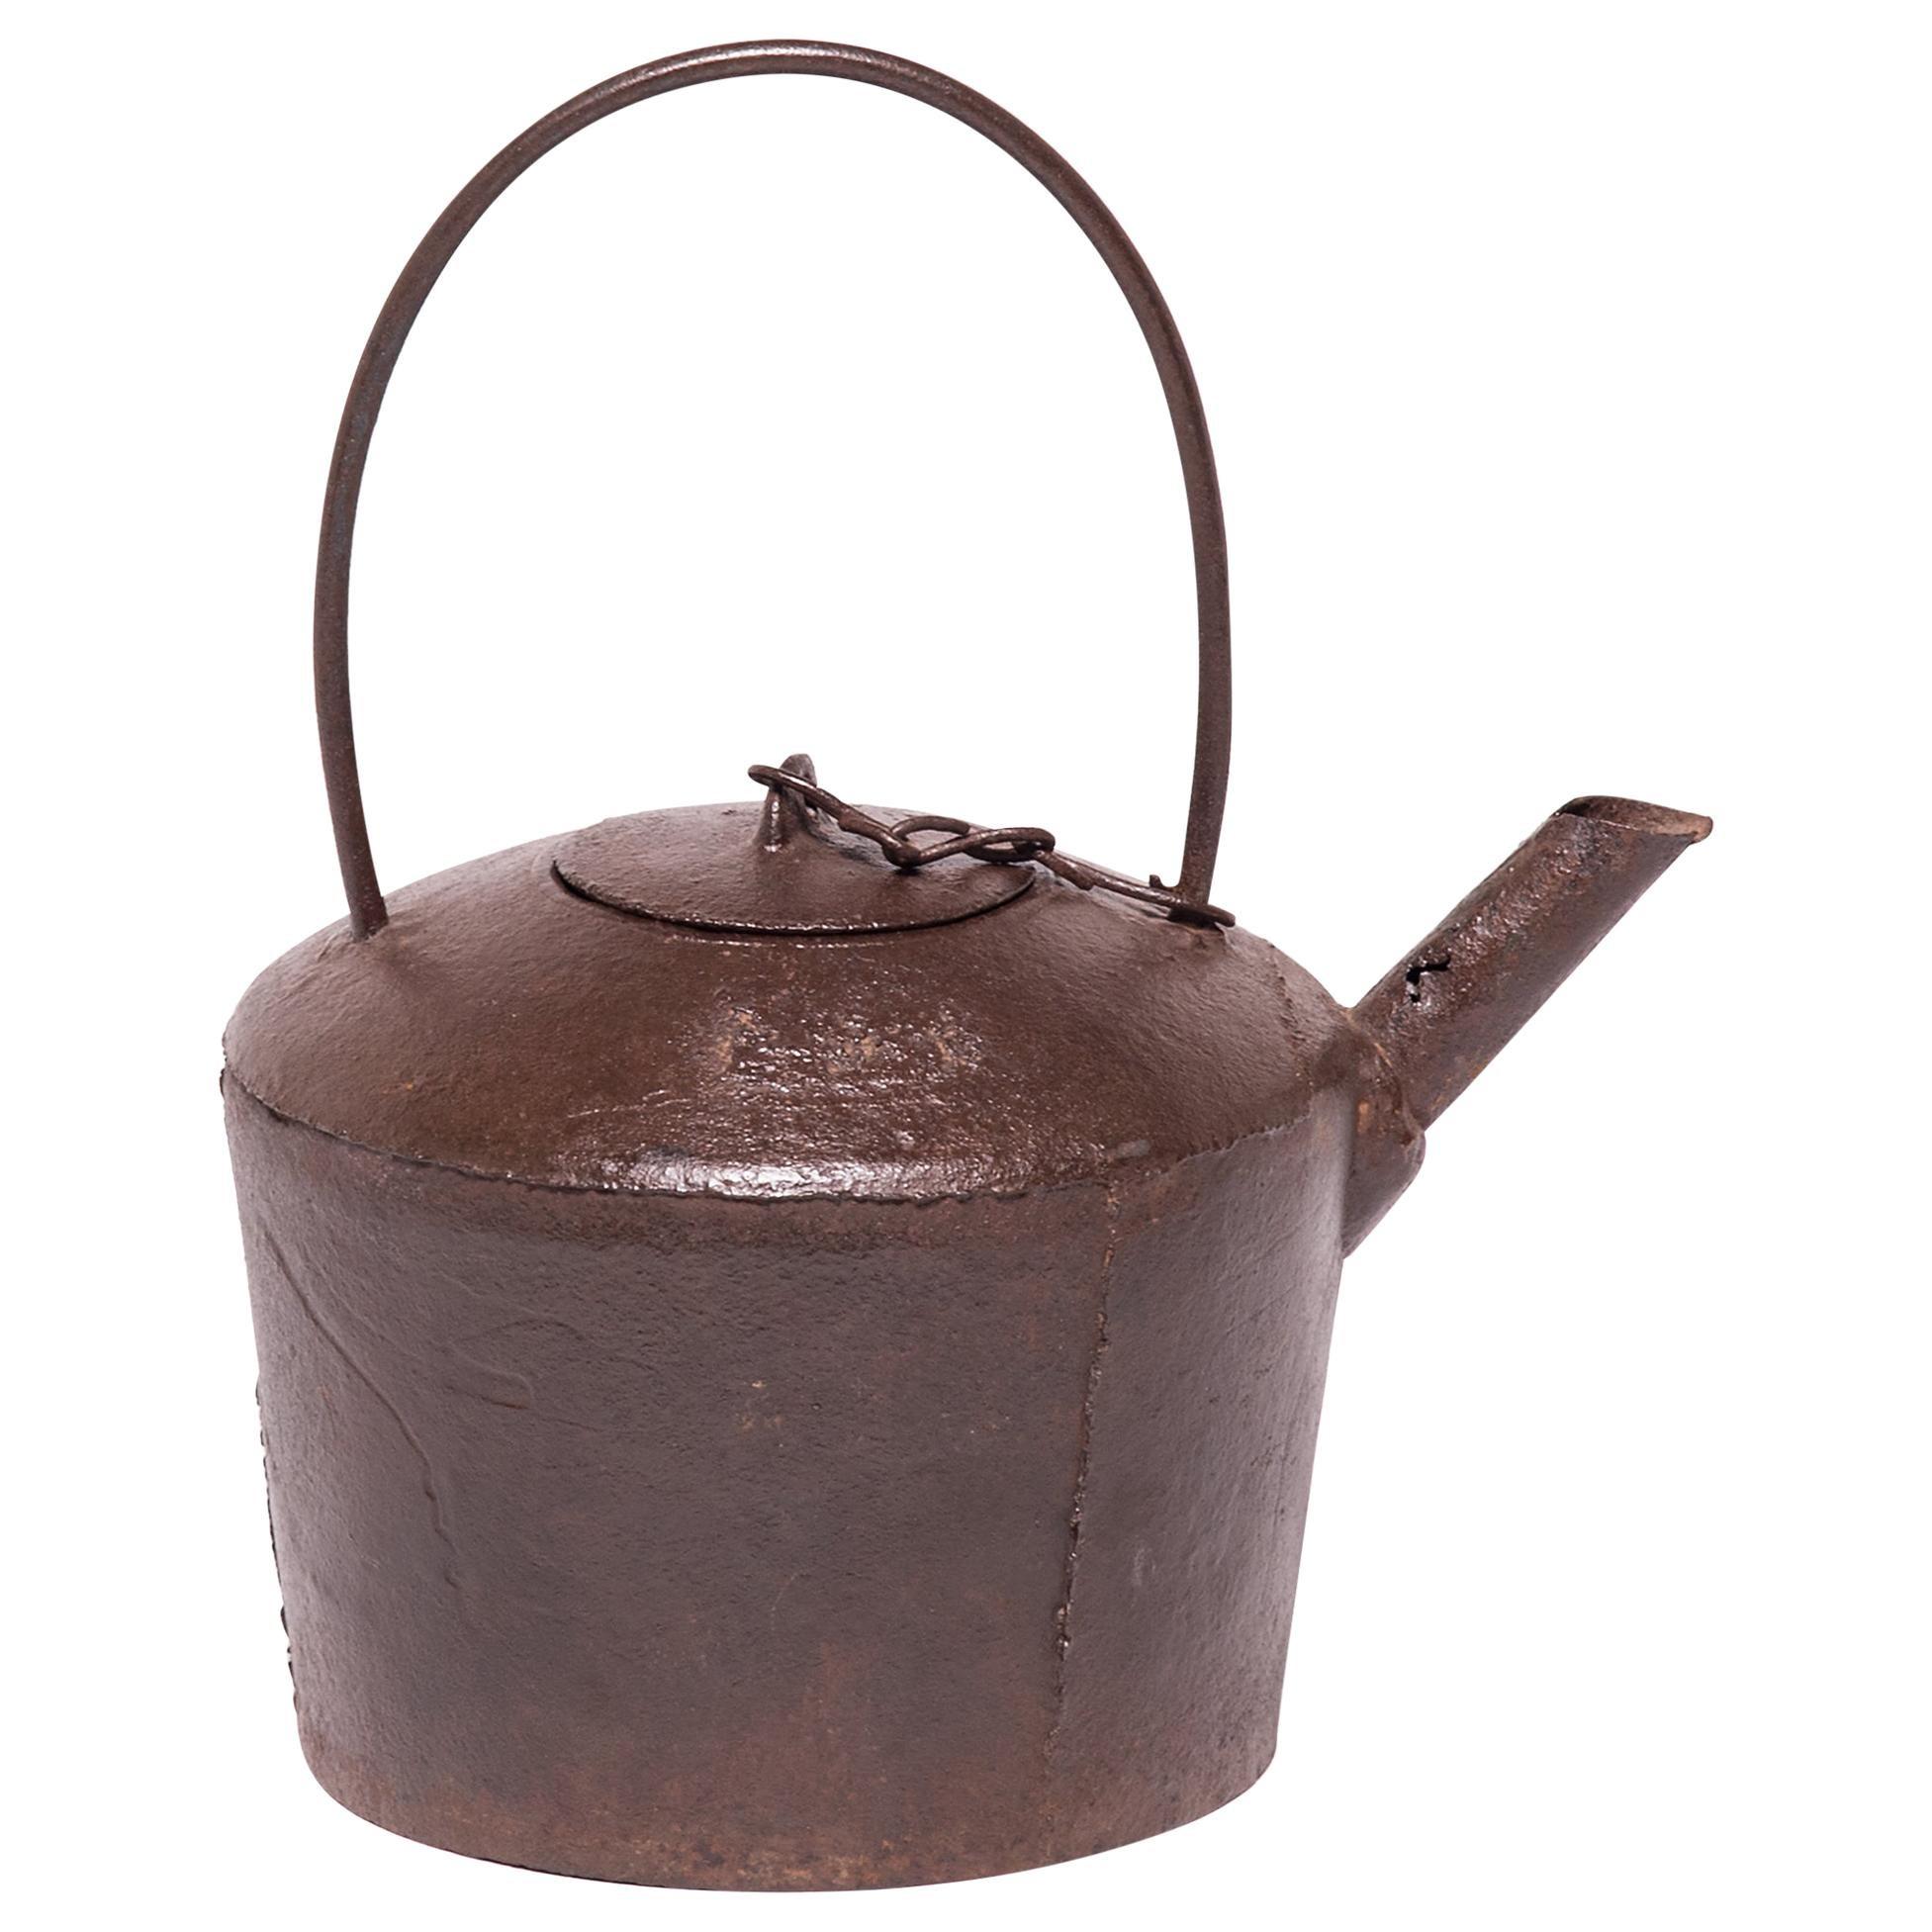 Chinese Cast Iron Tea Pot, c. 1900